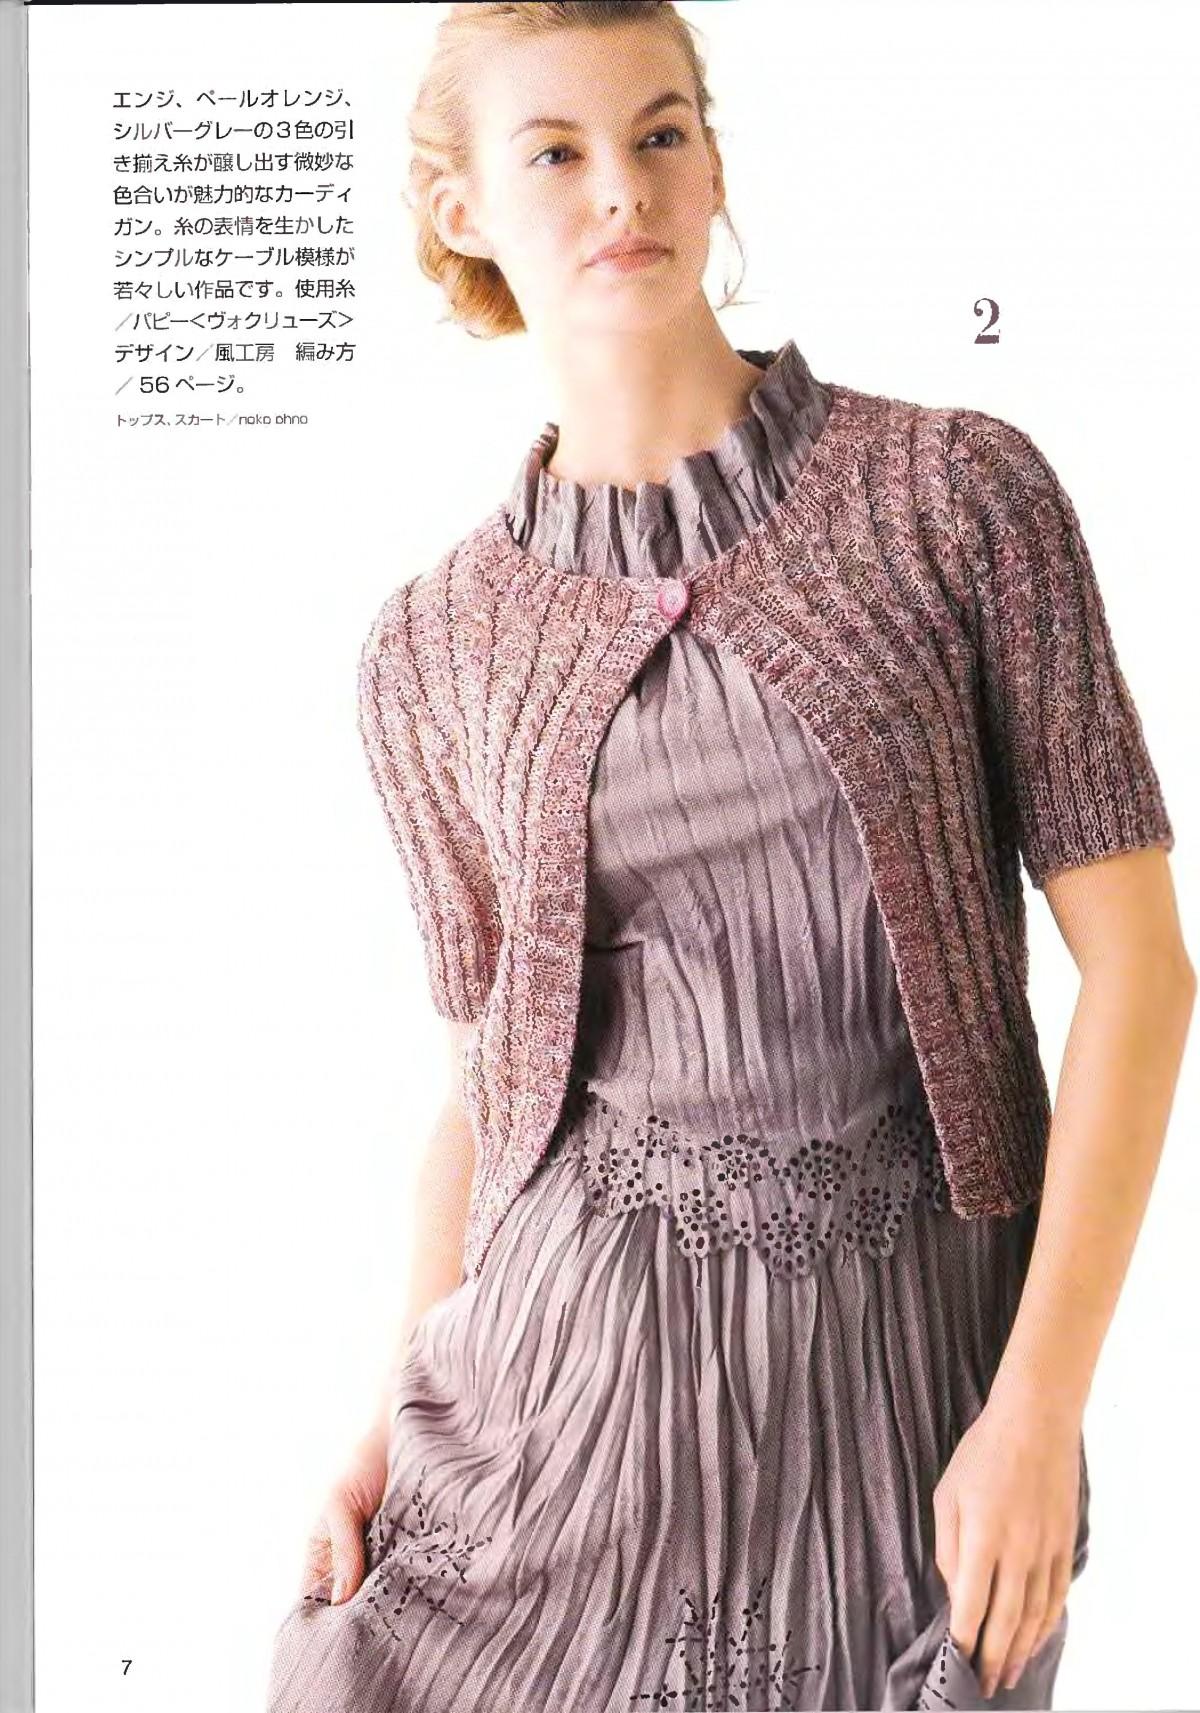 Lets-knit-series-NV4359-2008-Spring-Summer-sp-kr_5.jpg